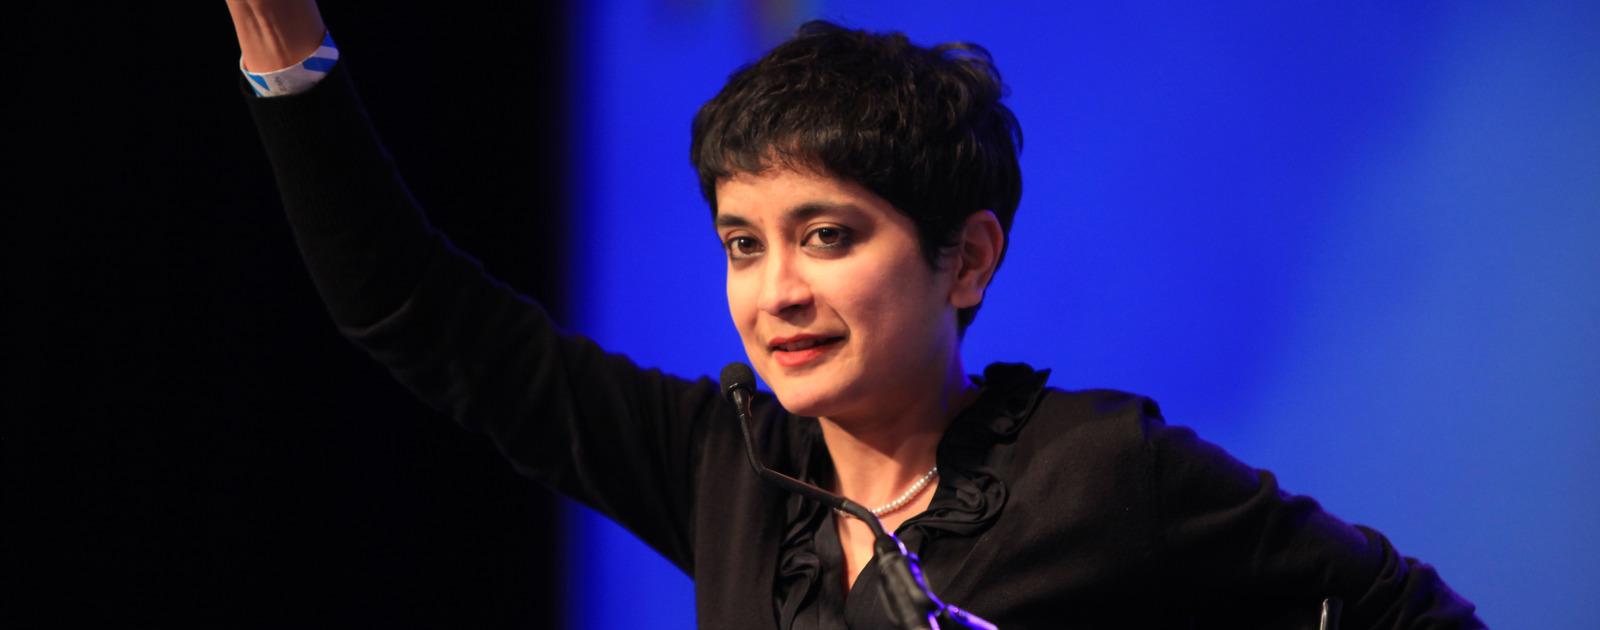 Shami Chakrabarti at Women of the World Festival 2013